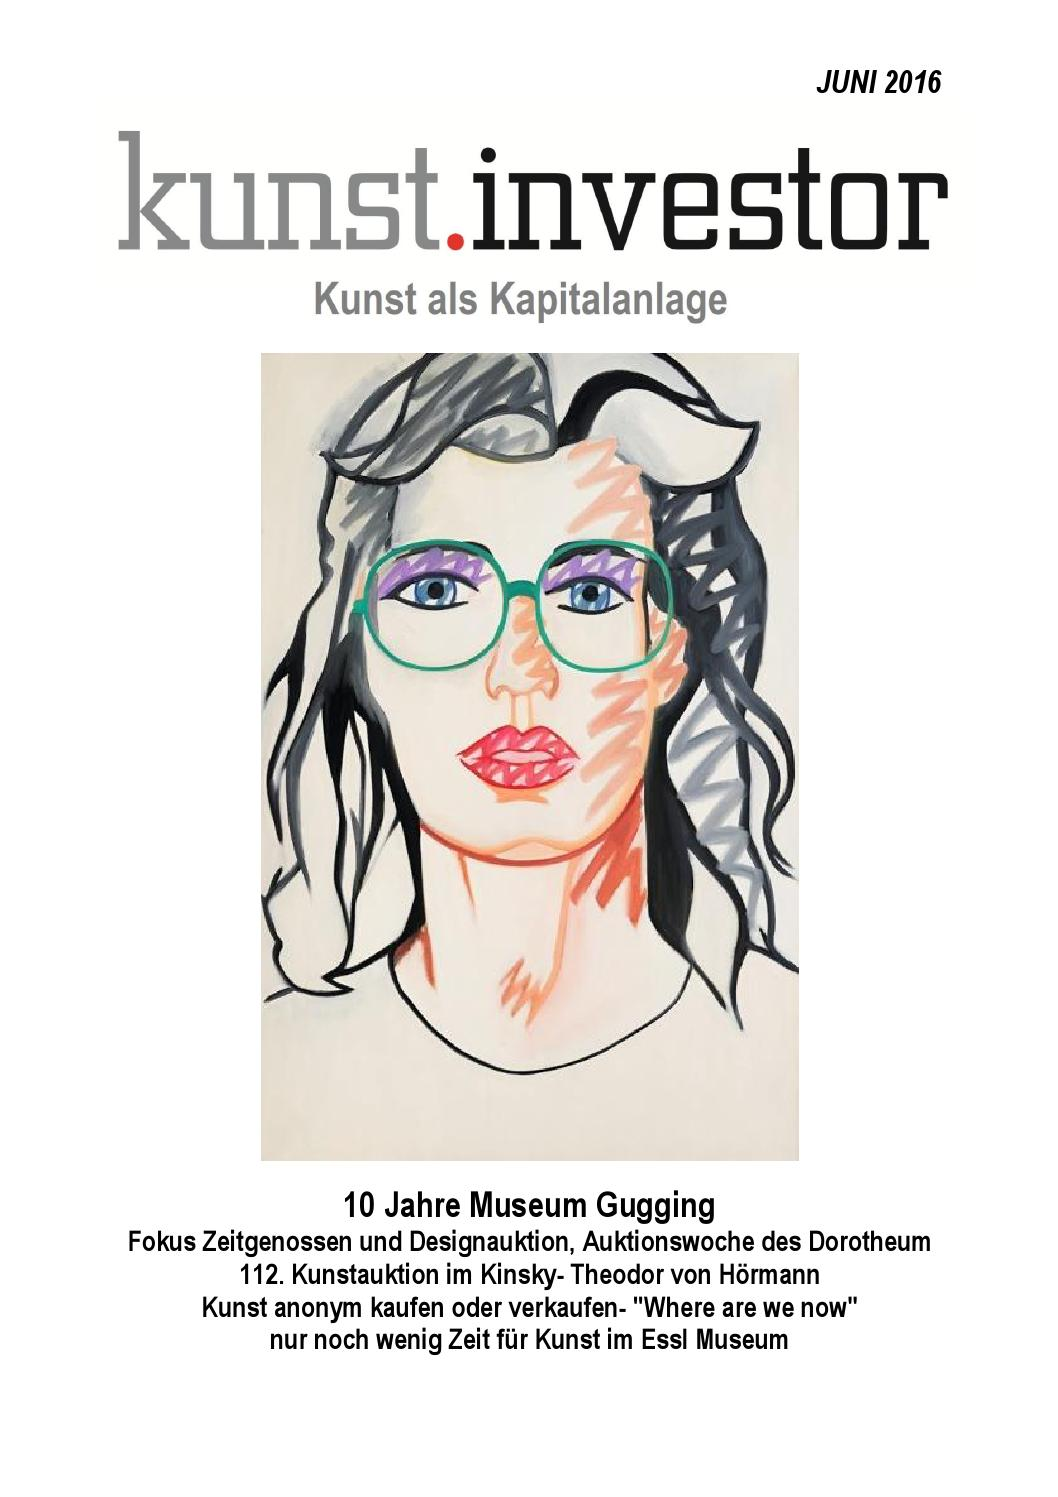 KUNSTINVESTOR JUNI 2016 by KUNSTMAGAZIN KUNSTINVESTOR - issuu